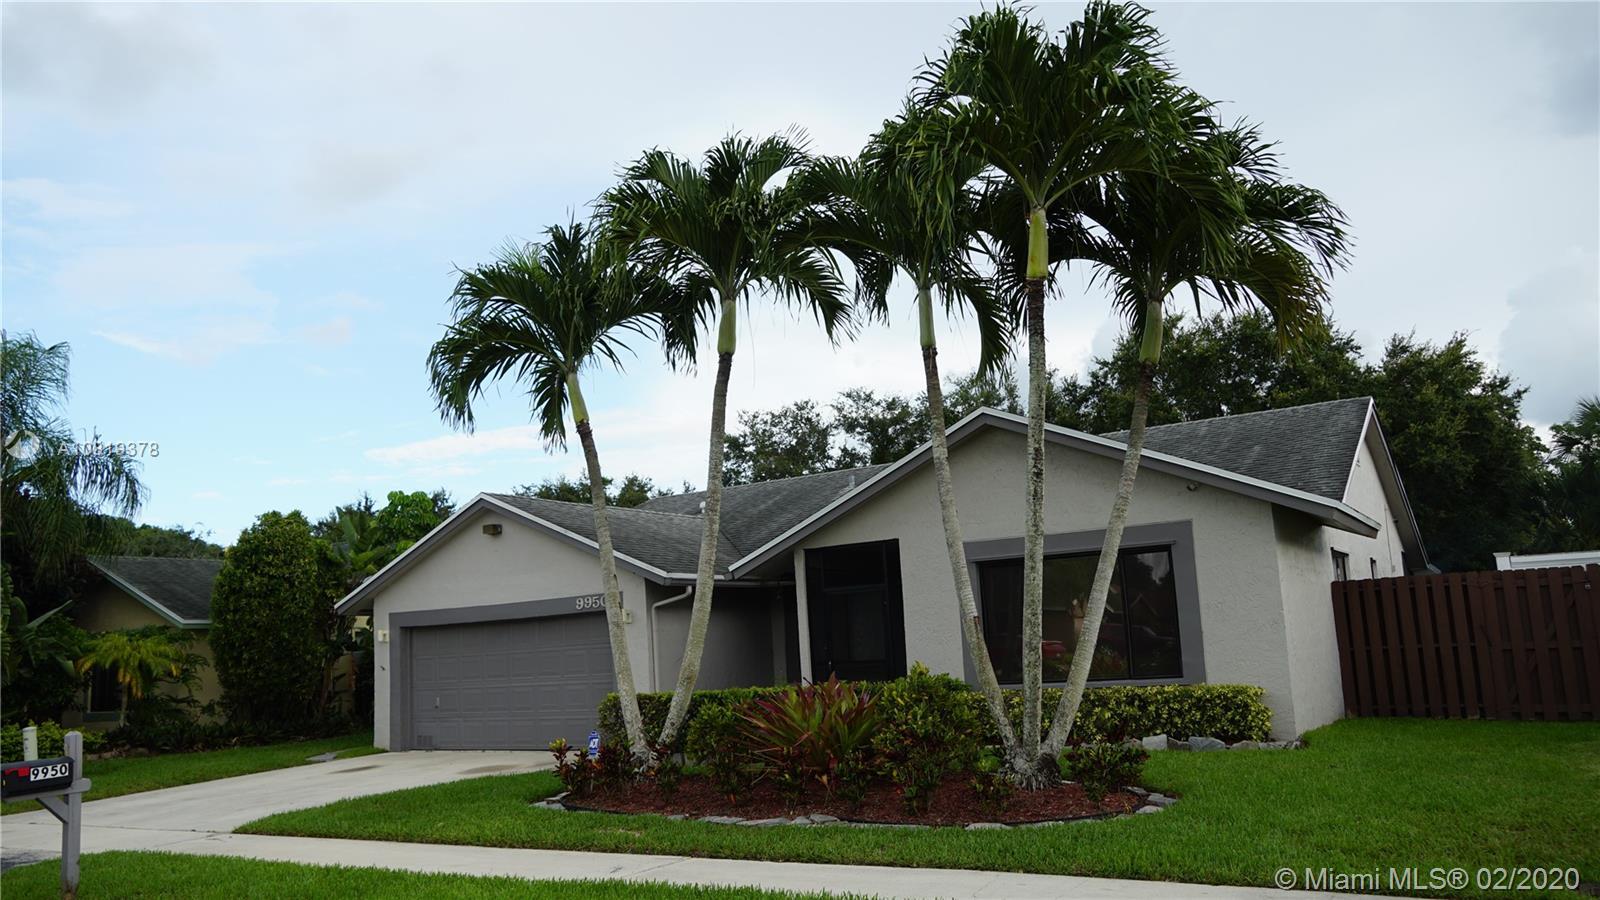 9950 NW 52 Street, Sunrise, FL 33351 - Sunrise, FL real estate listing